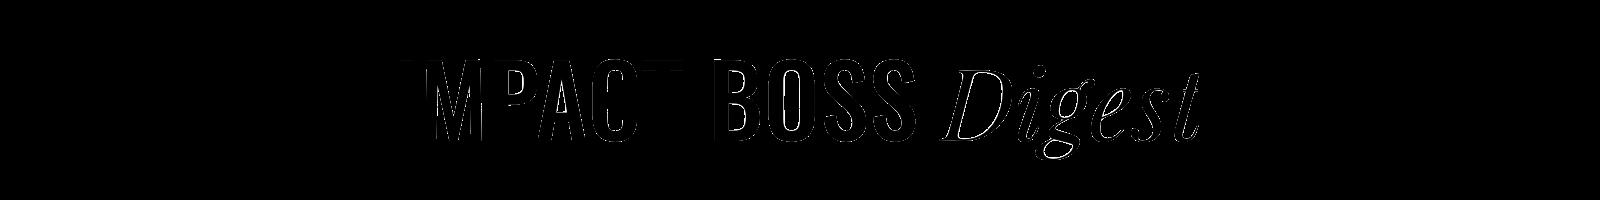 Impact Boss Digest